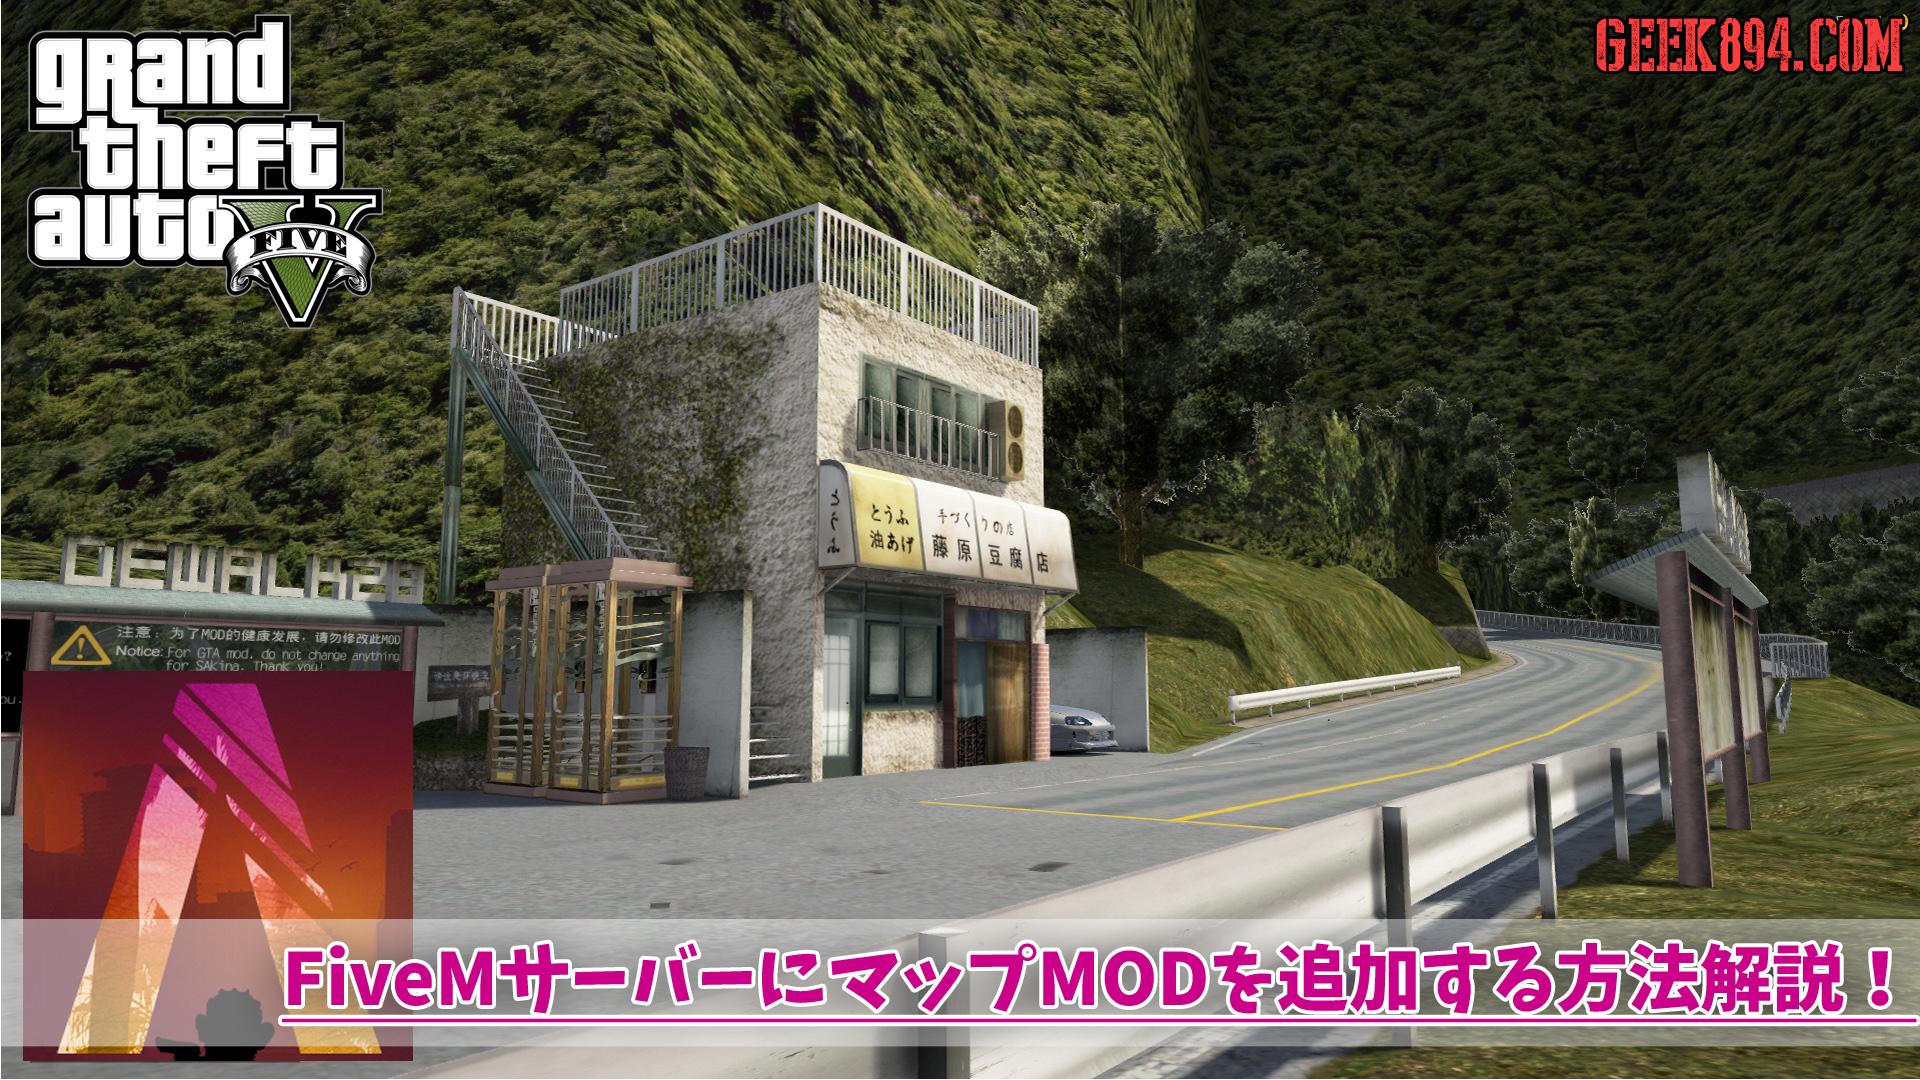 GTA5でMODが使えるオンライン「FiveM」の基本的な導入方法と使い方の解説